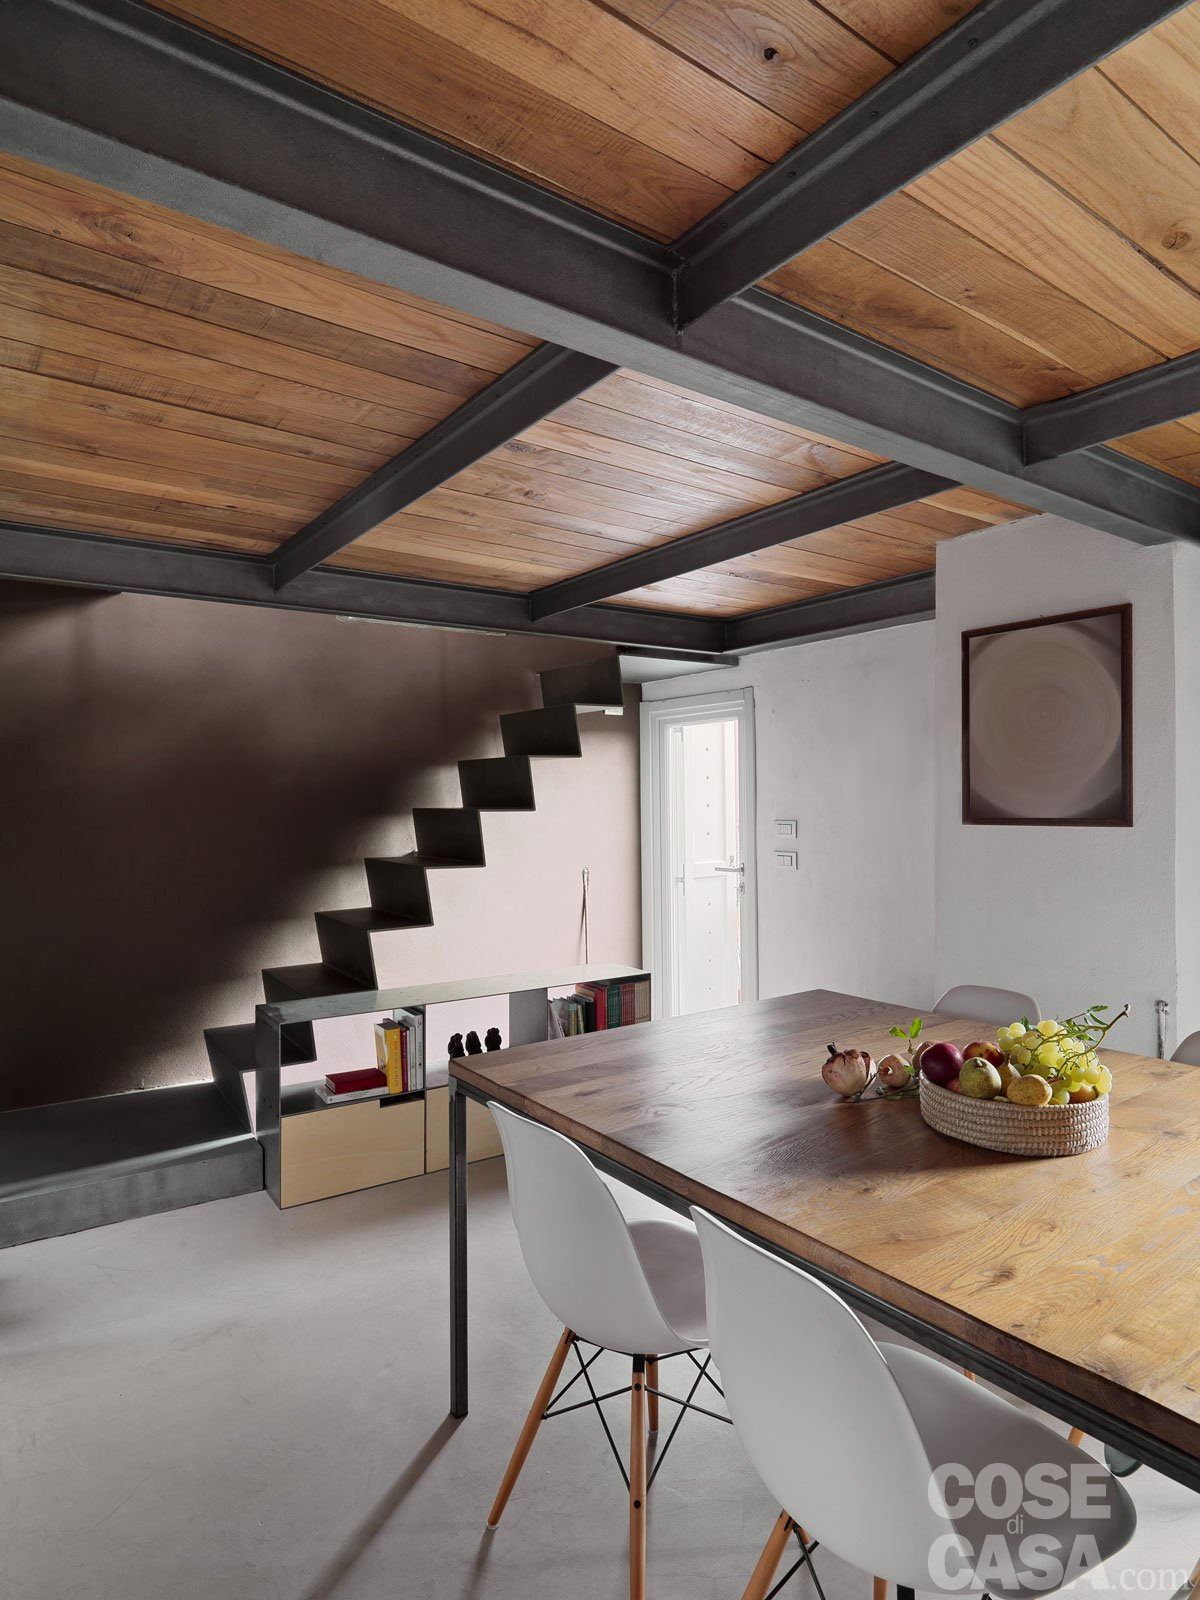 65 mq una casa che si sviluppa in verticale cose di casa - Chiudere una finestra di casa ...